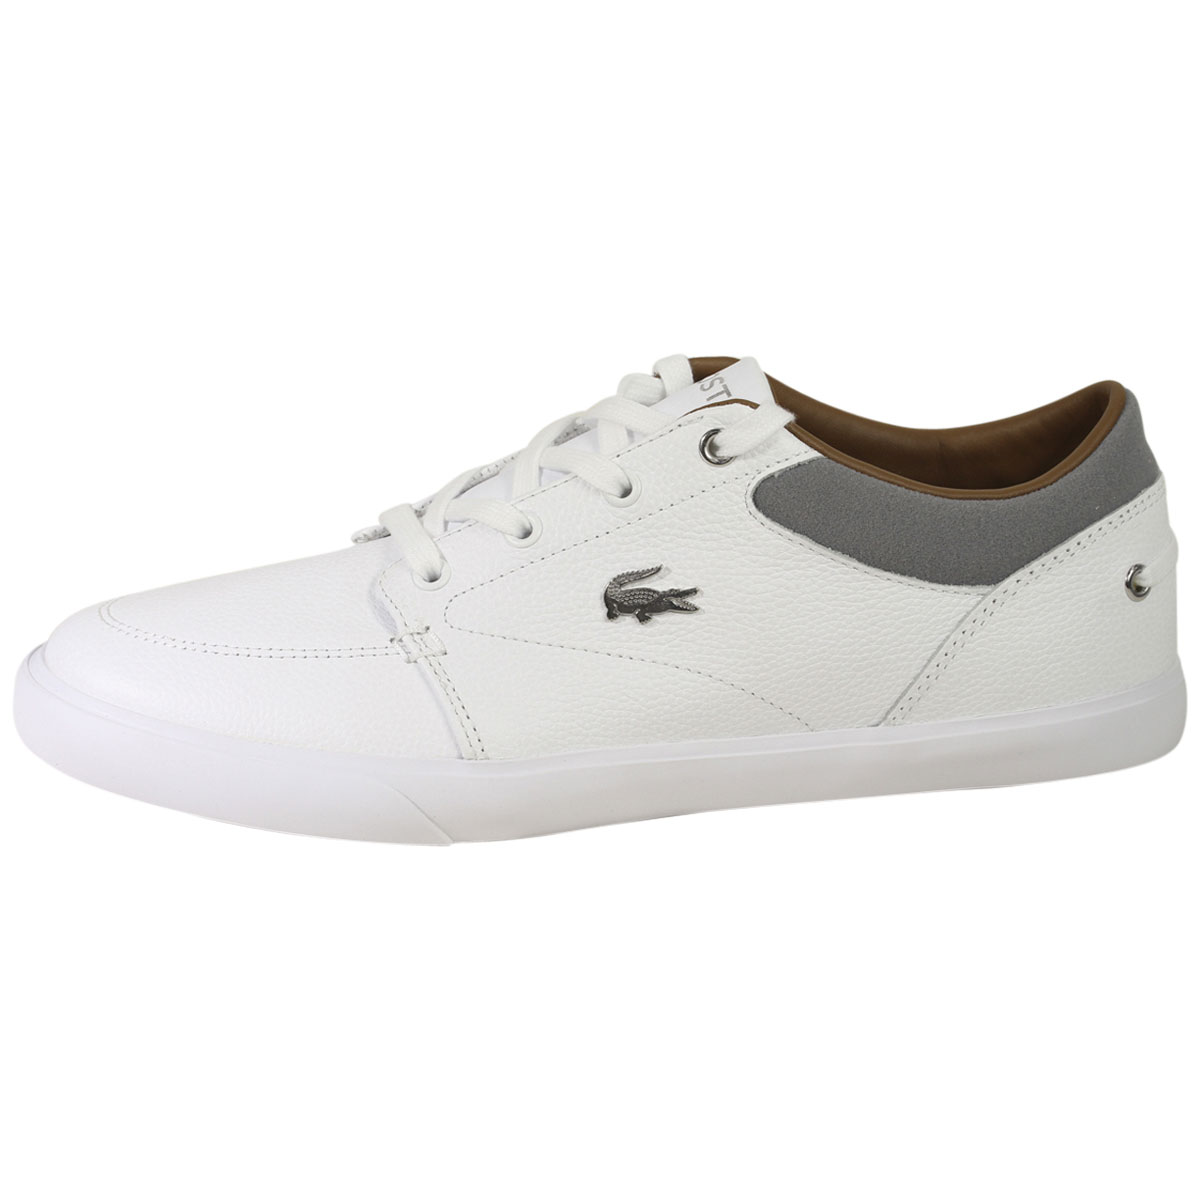 Lacoste-Men-039-s-Bayliss-118-Sneakers-Shoes thumbnail 16